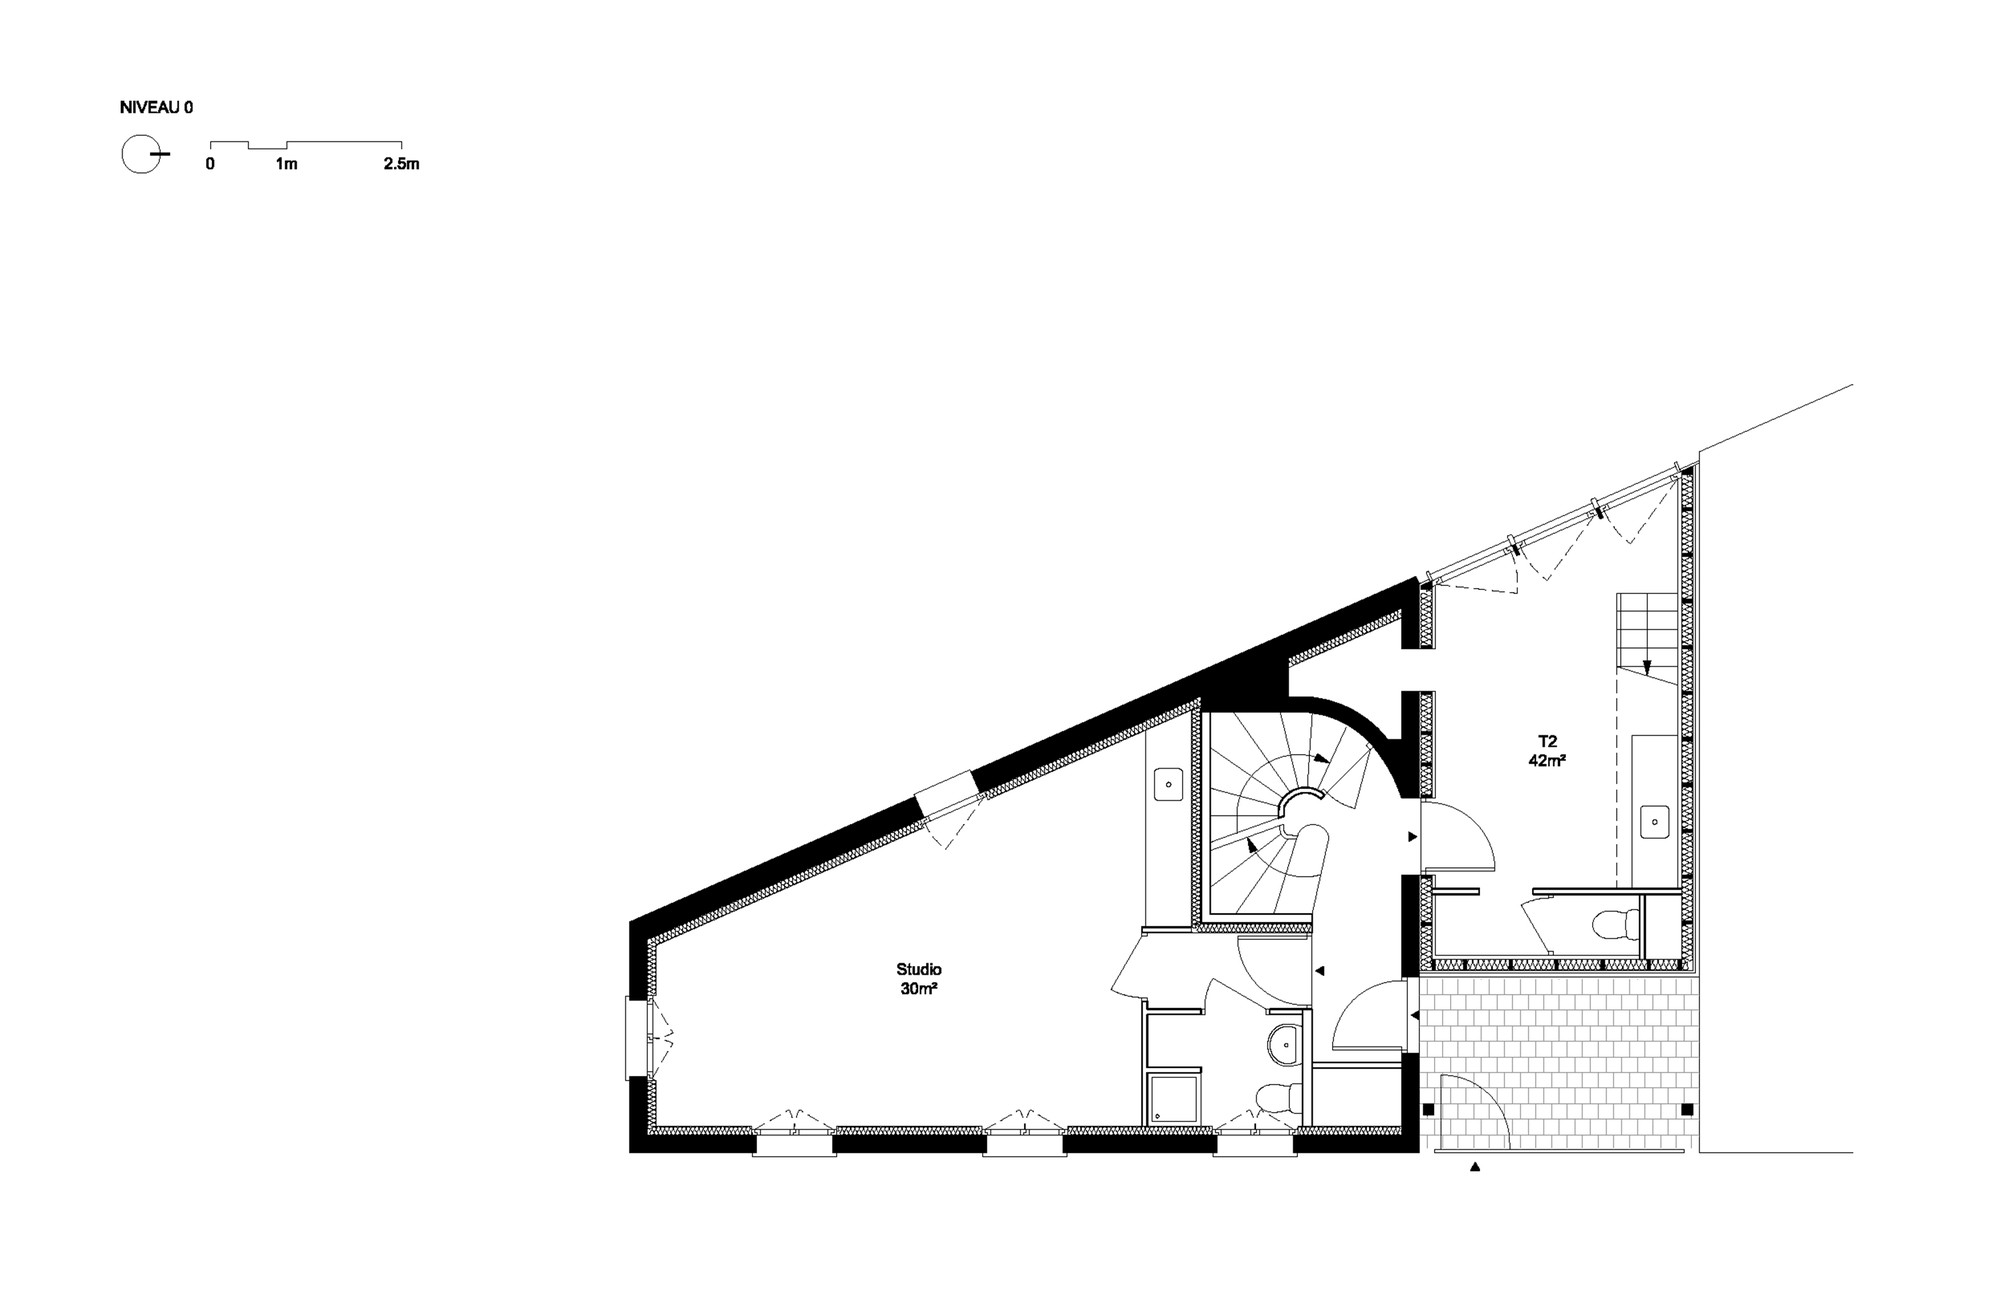 galer a de au bon coin ramdam architectes 21. Black Bedroom Furniture Sets. Home Design Ideas